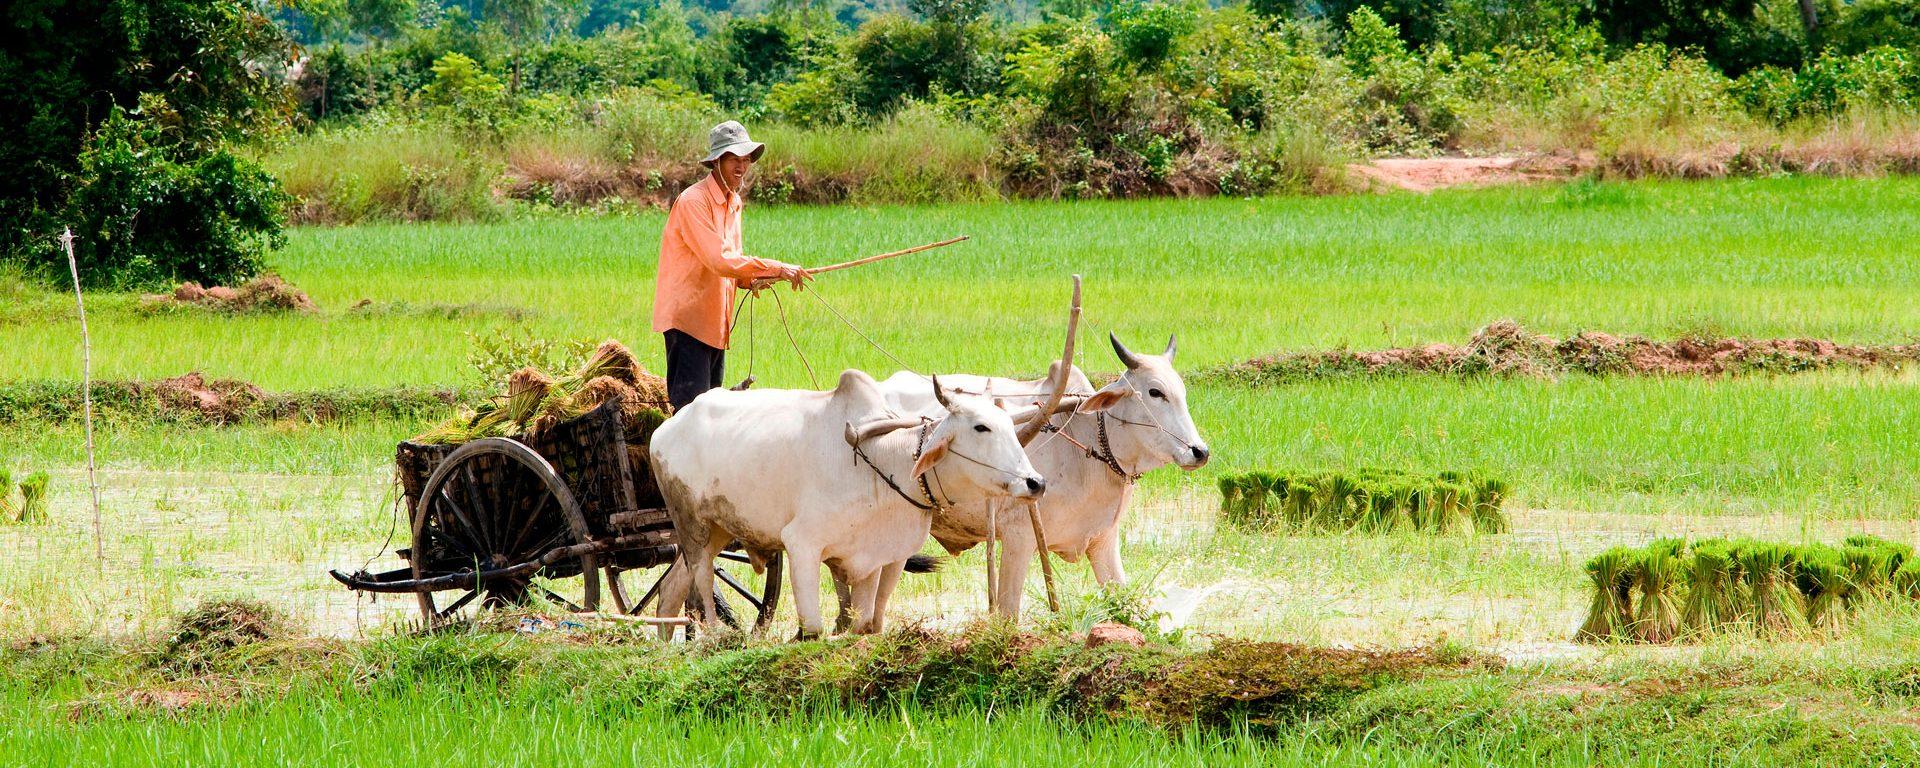 Man drives ox cart through rice fields near Tonle Bati, Cambodia